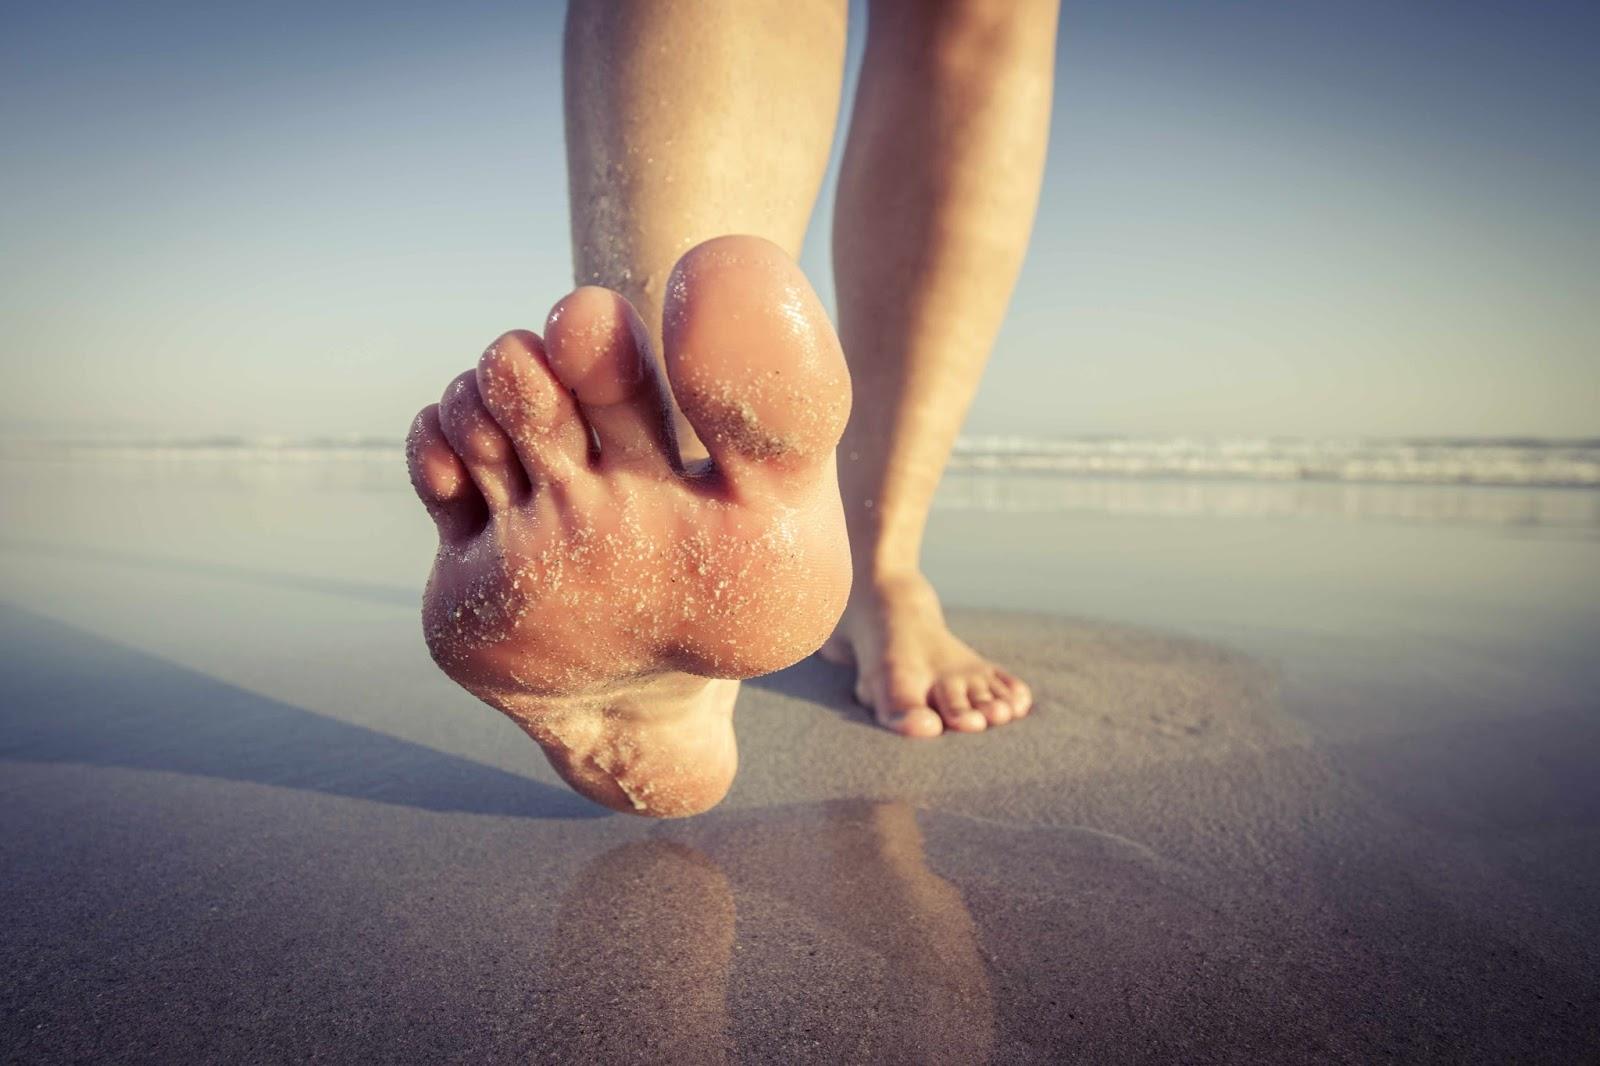 Image Gallery walking barefoot